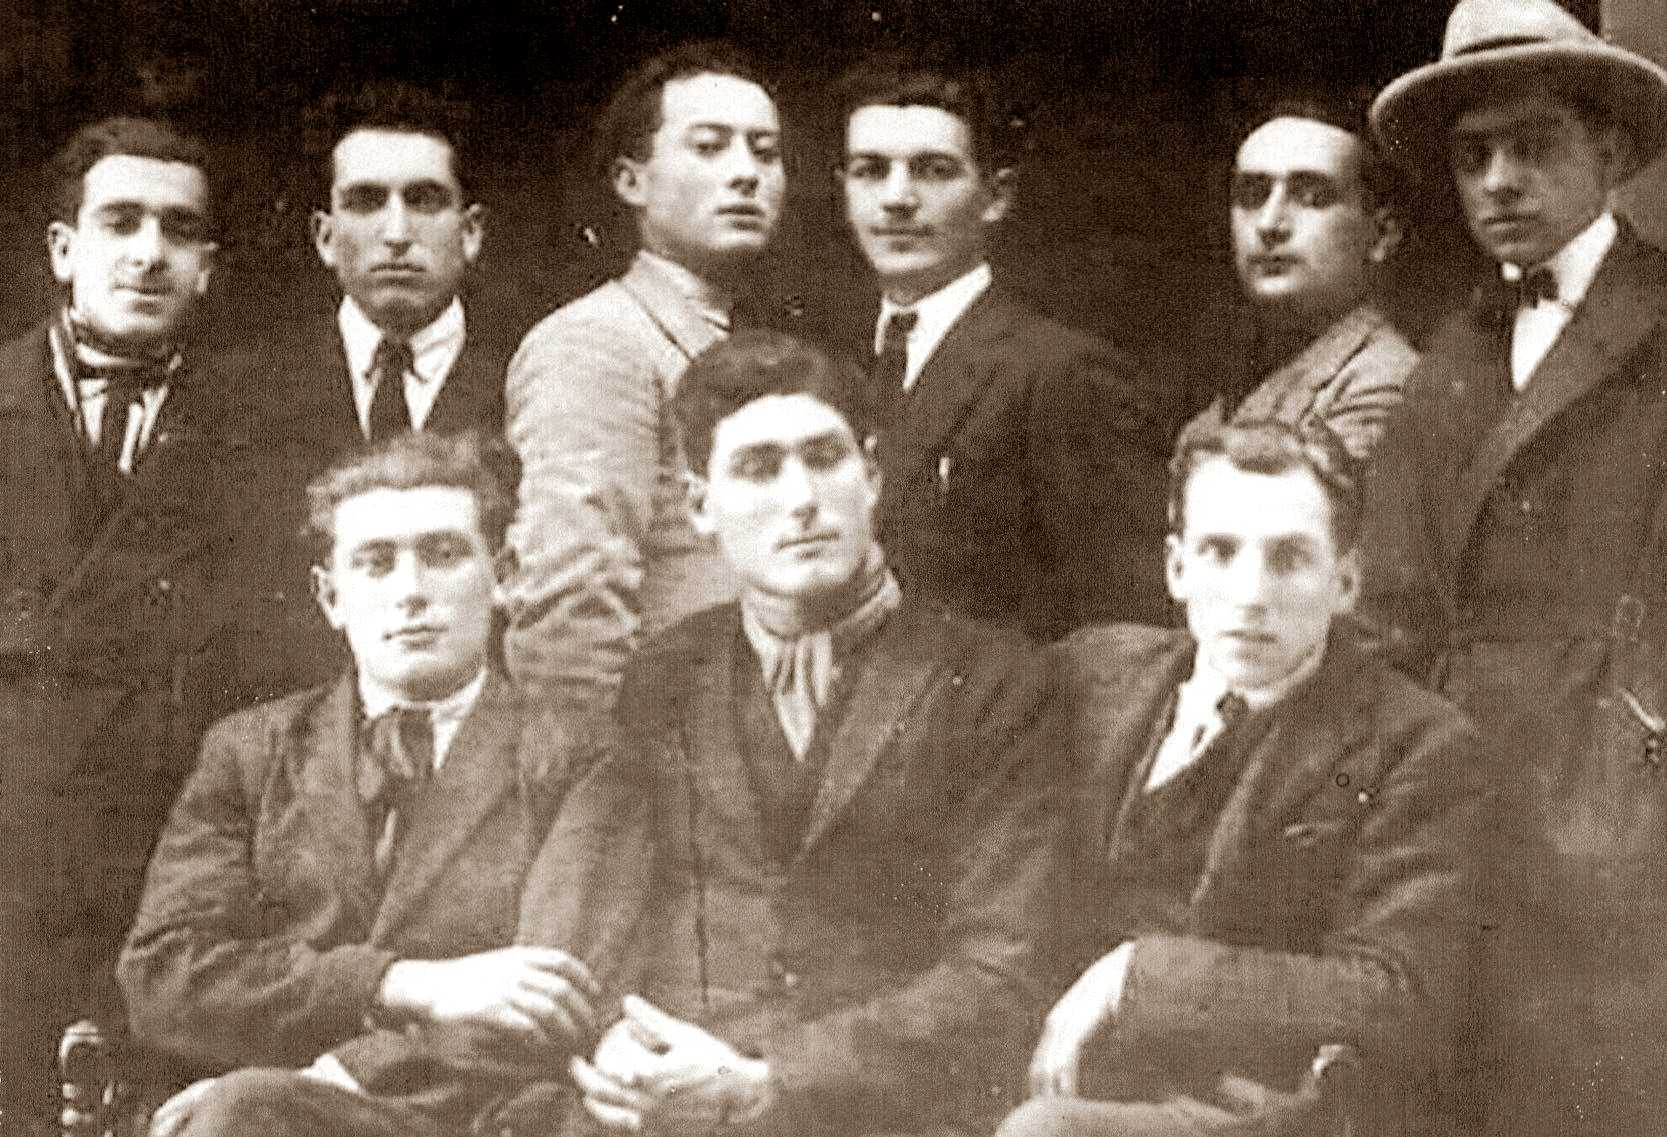 Grup anarquista de Bazzano (1925). Asseguts, d'esquerra a dreta: Gino Balestri i els germans Angelo i Raffaello Zanette. Drets, d'esquerra a dreta: Sacchetti, Sardelli, Giacomo Famigli, Pietro Monesi, Cavedoi i la persona del capell, que no ha pogut ser identificada